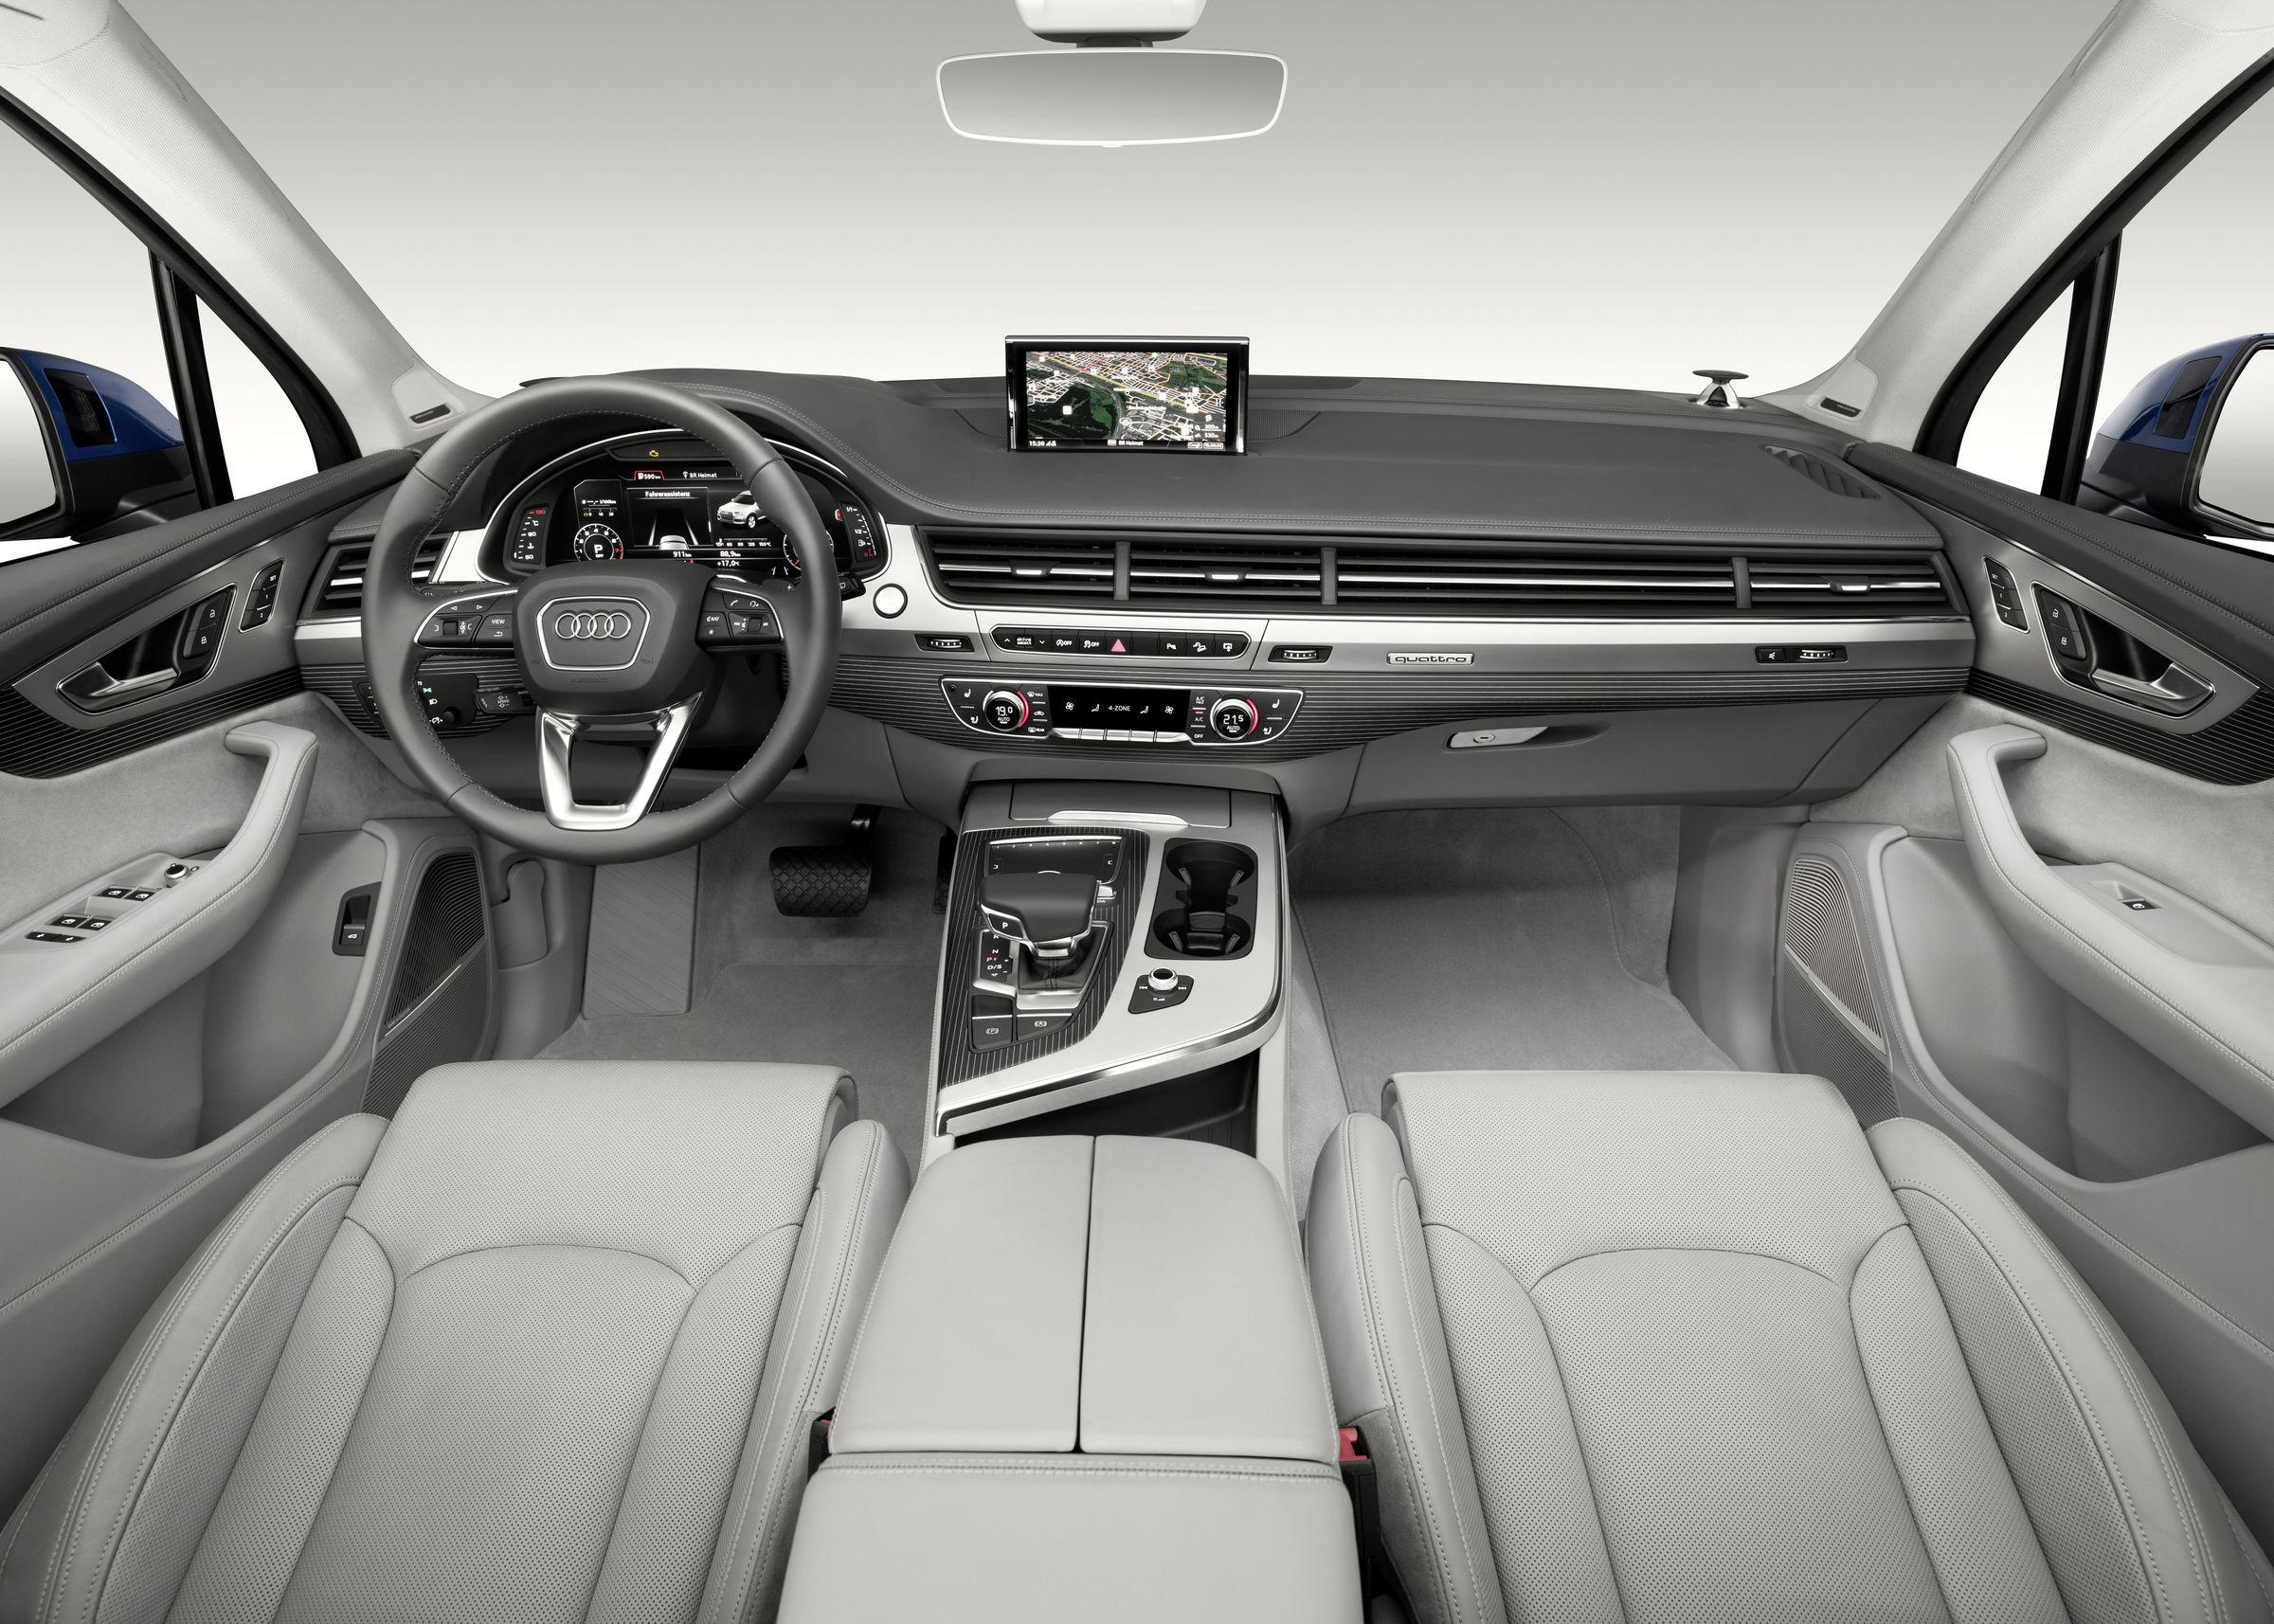 audi img car sports hire prom vehicle self drive